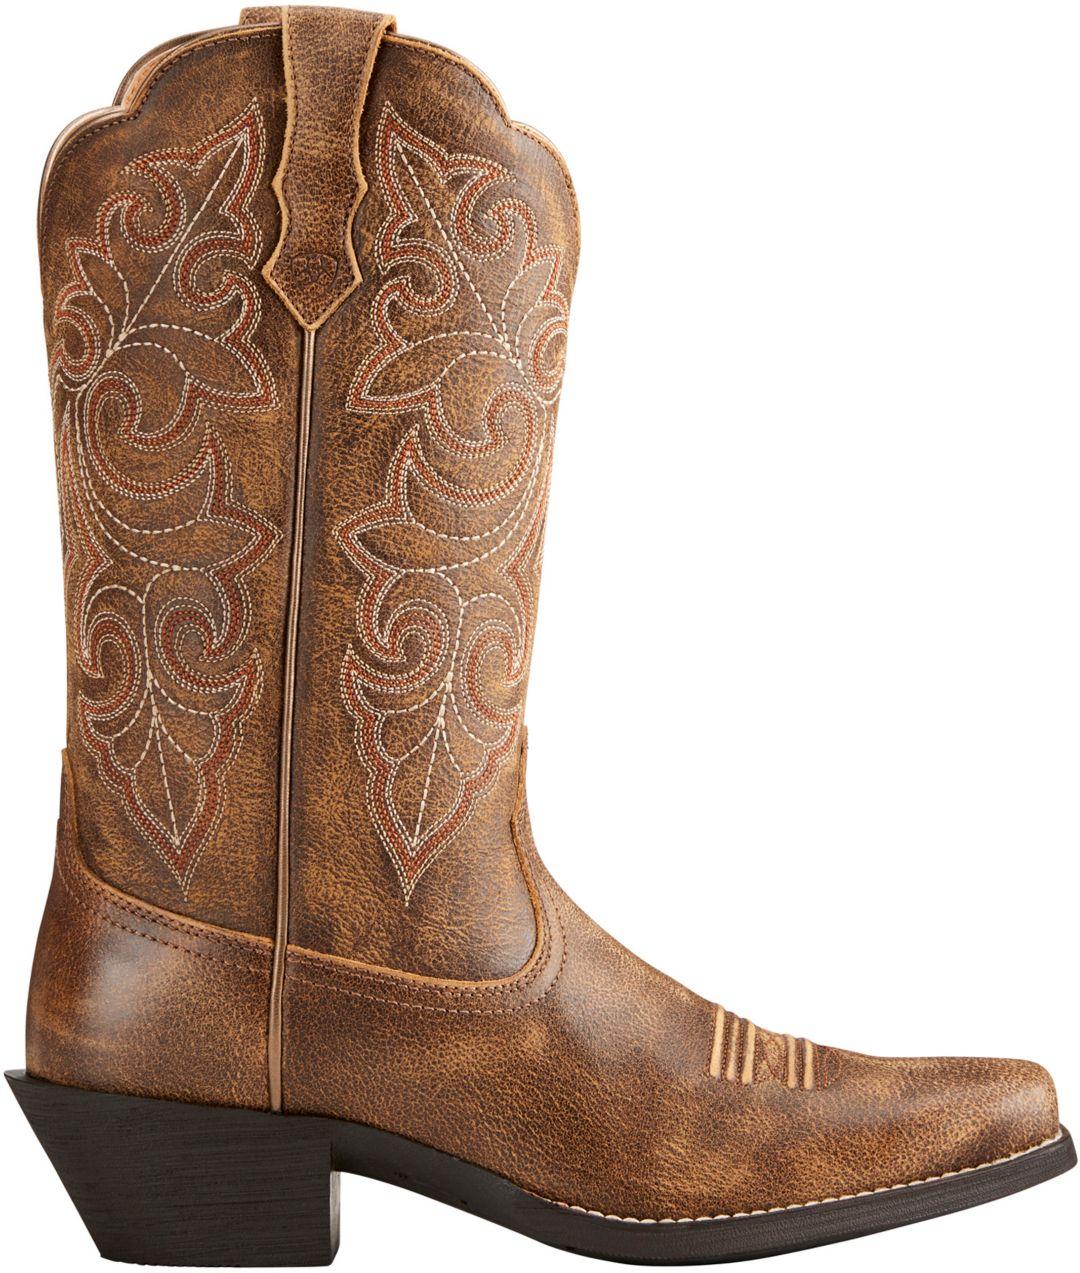 cf648e8e677 Ariat Women's Round Up Square Toe Western Boots